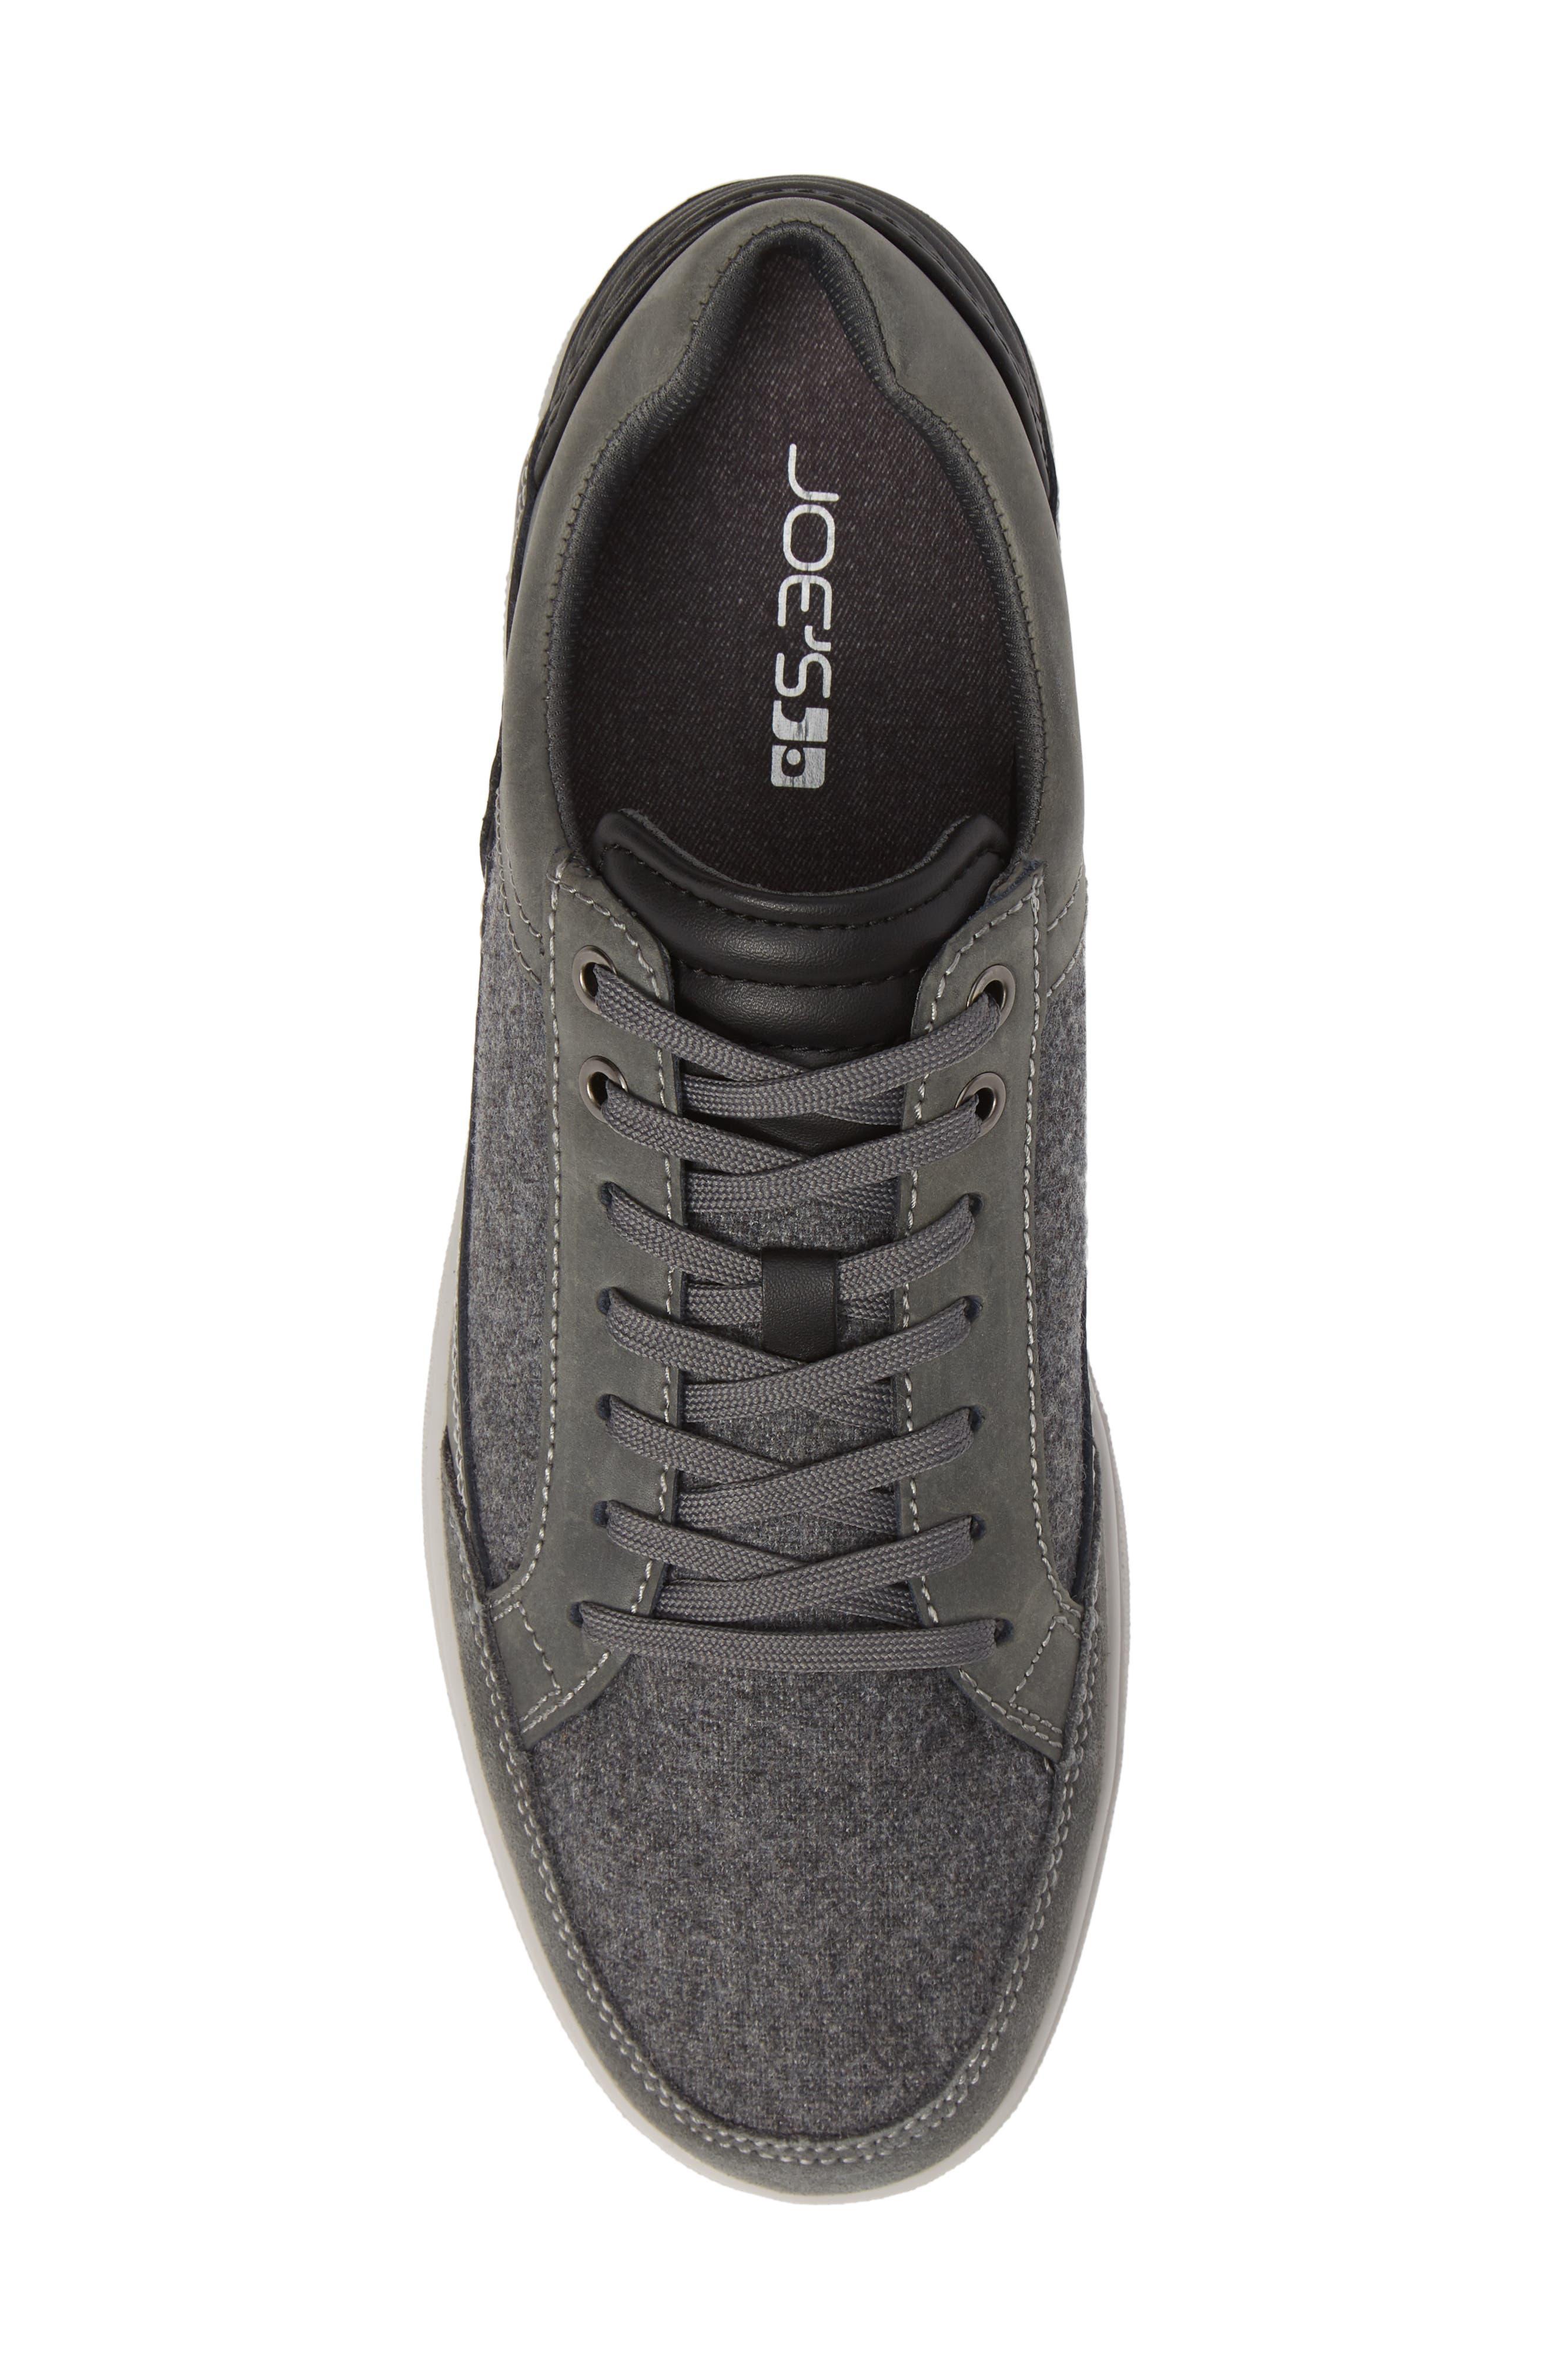 Casual Joe Sneaker,                             Alternate thumbnail 5, color,                             GREY WOOL